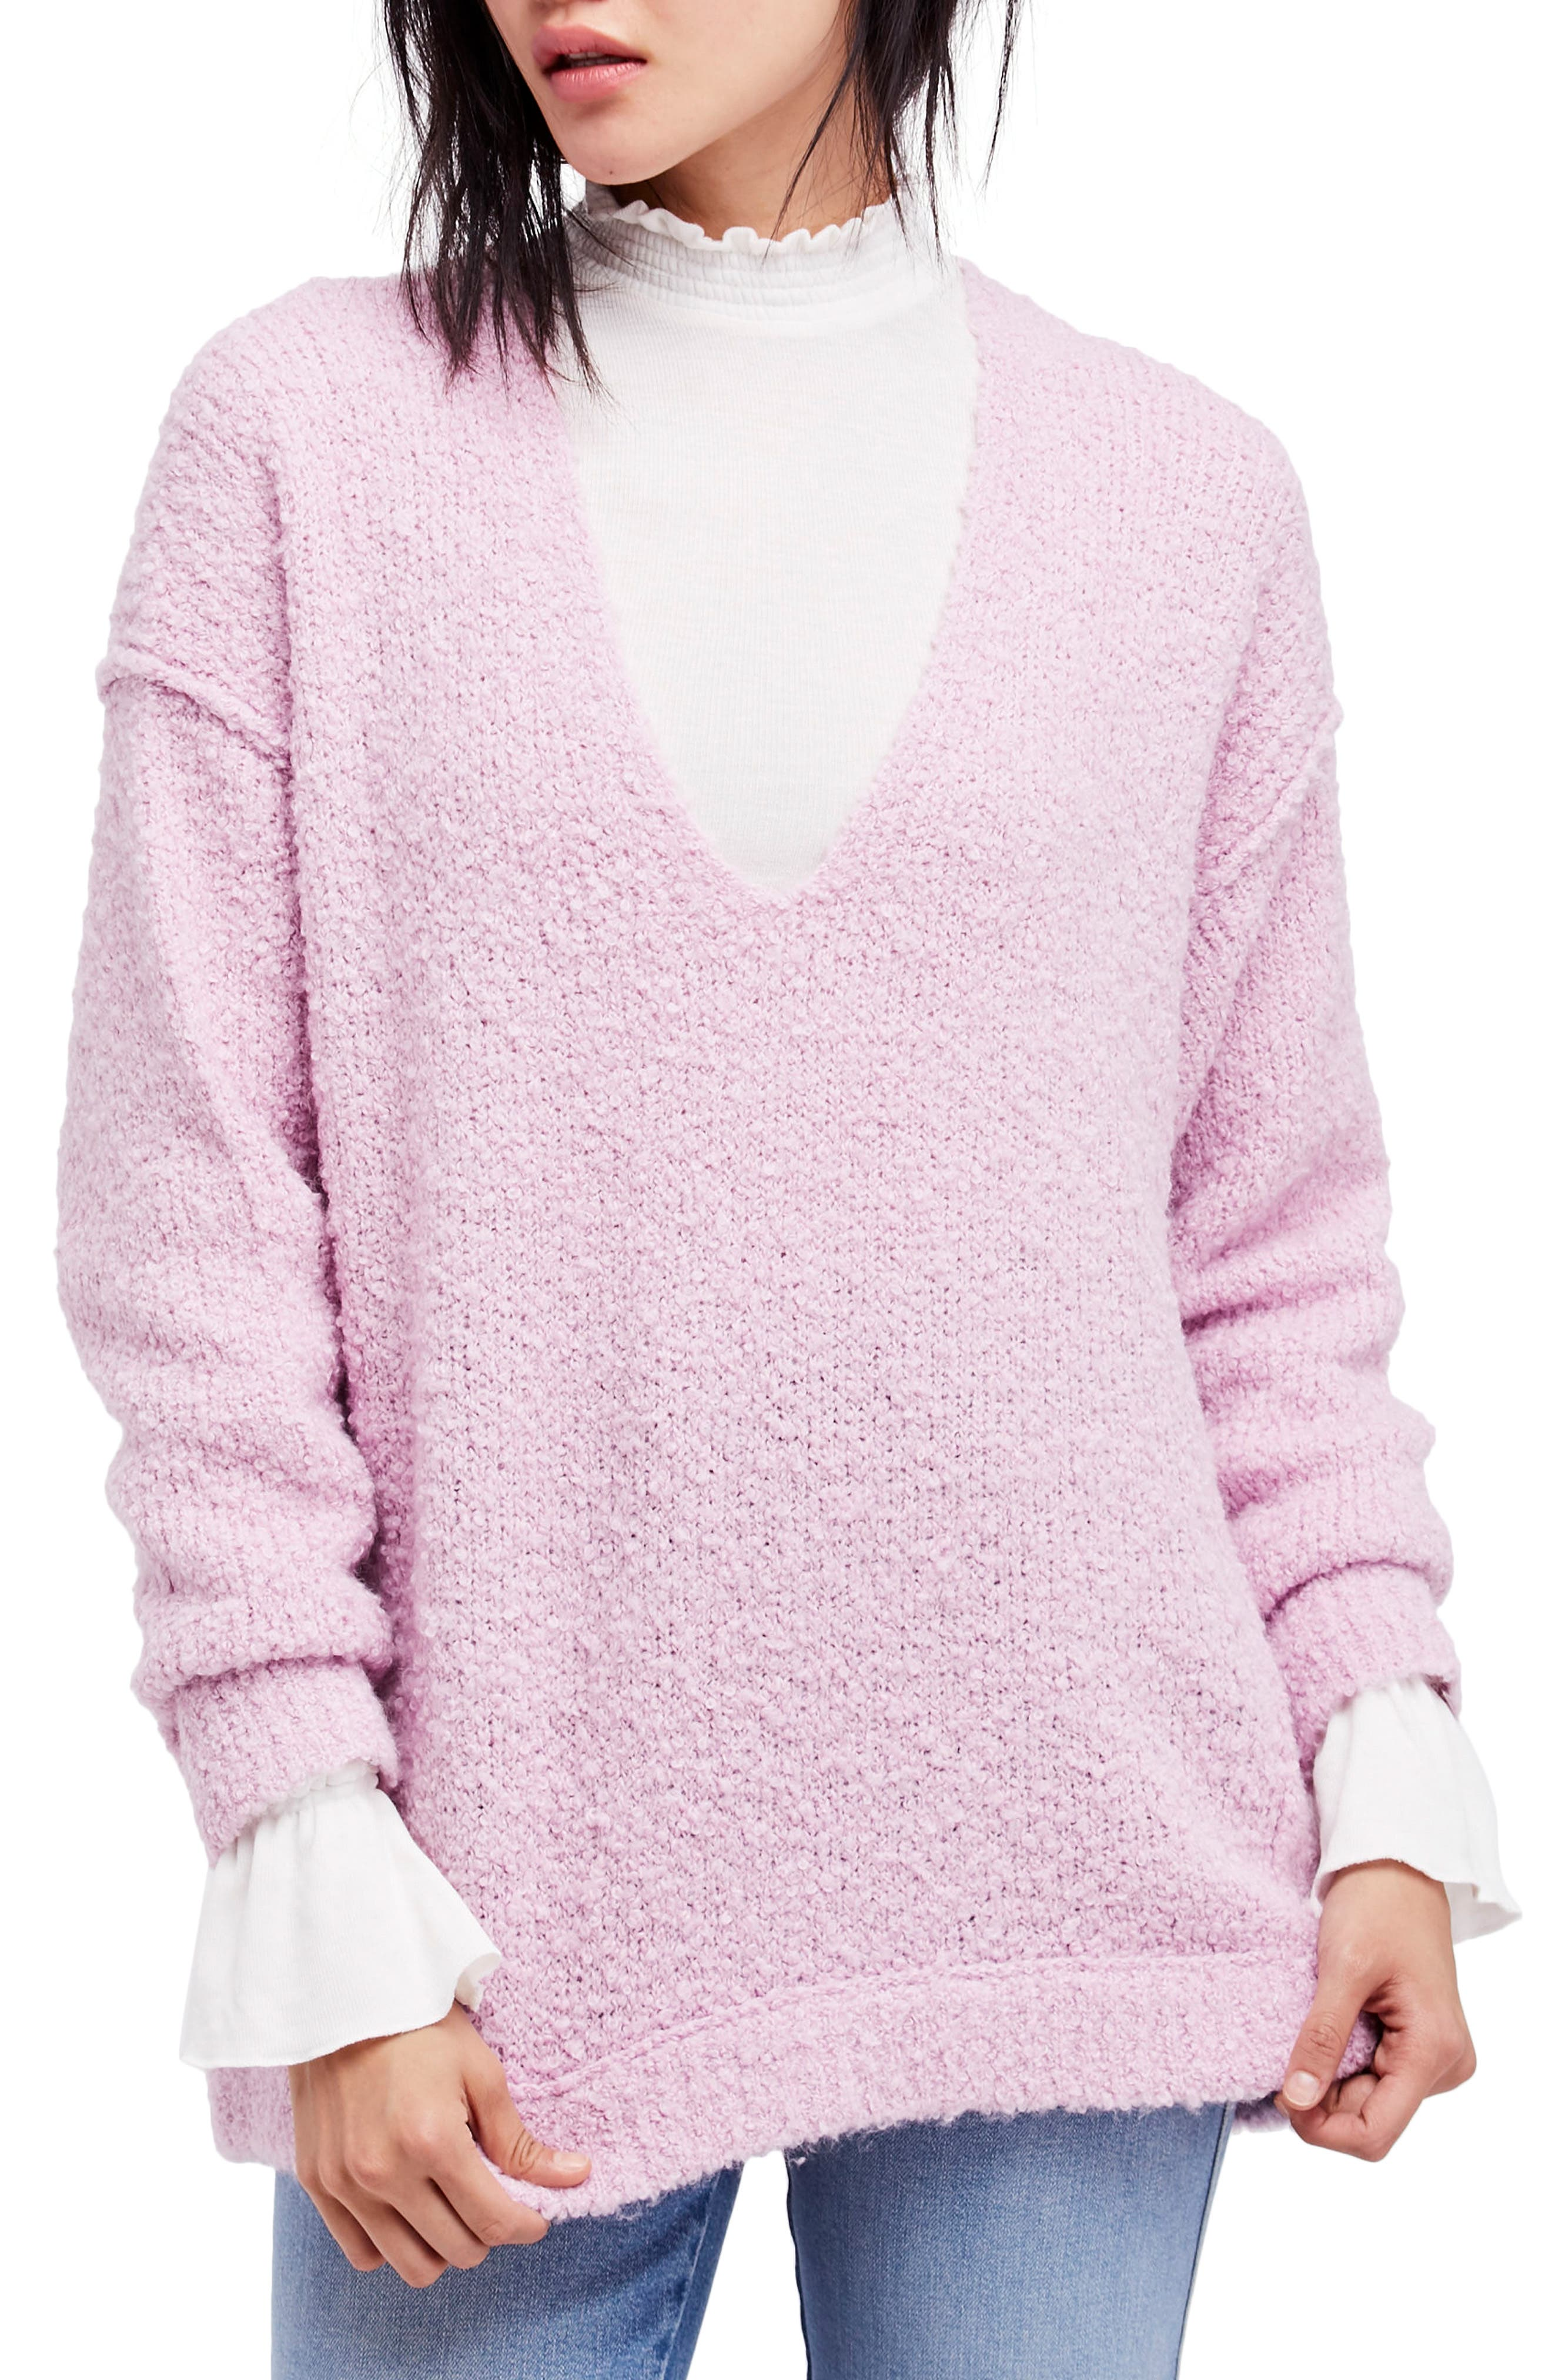 Alternate Image 1 Selected - Free People Lofty V-Neck Sweater